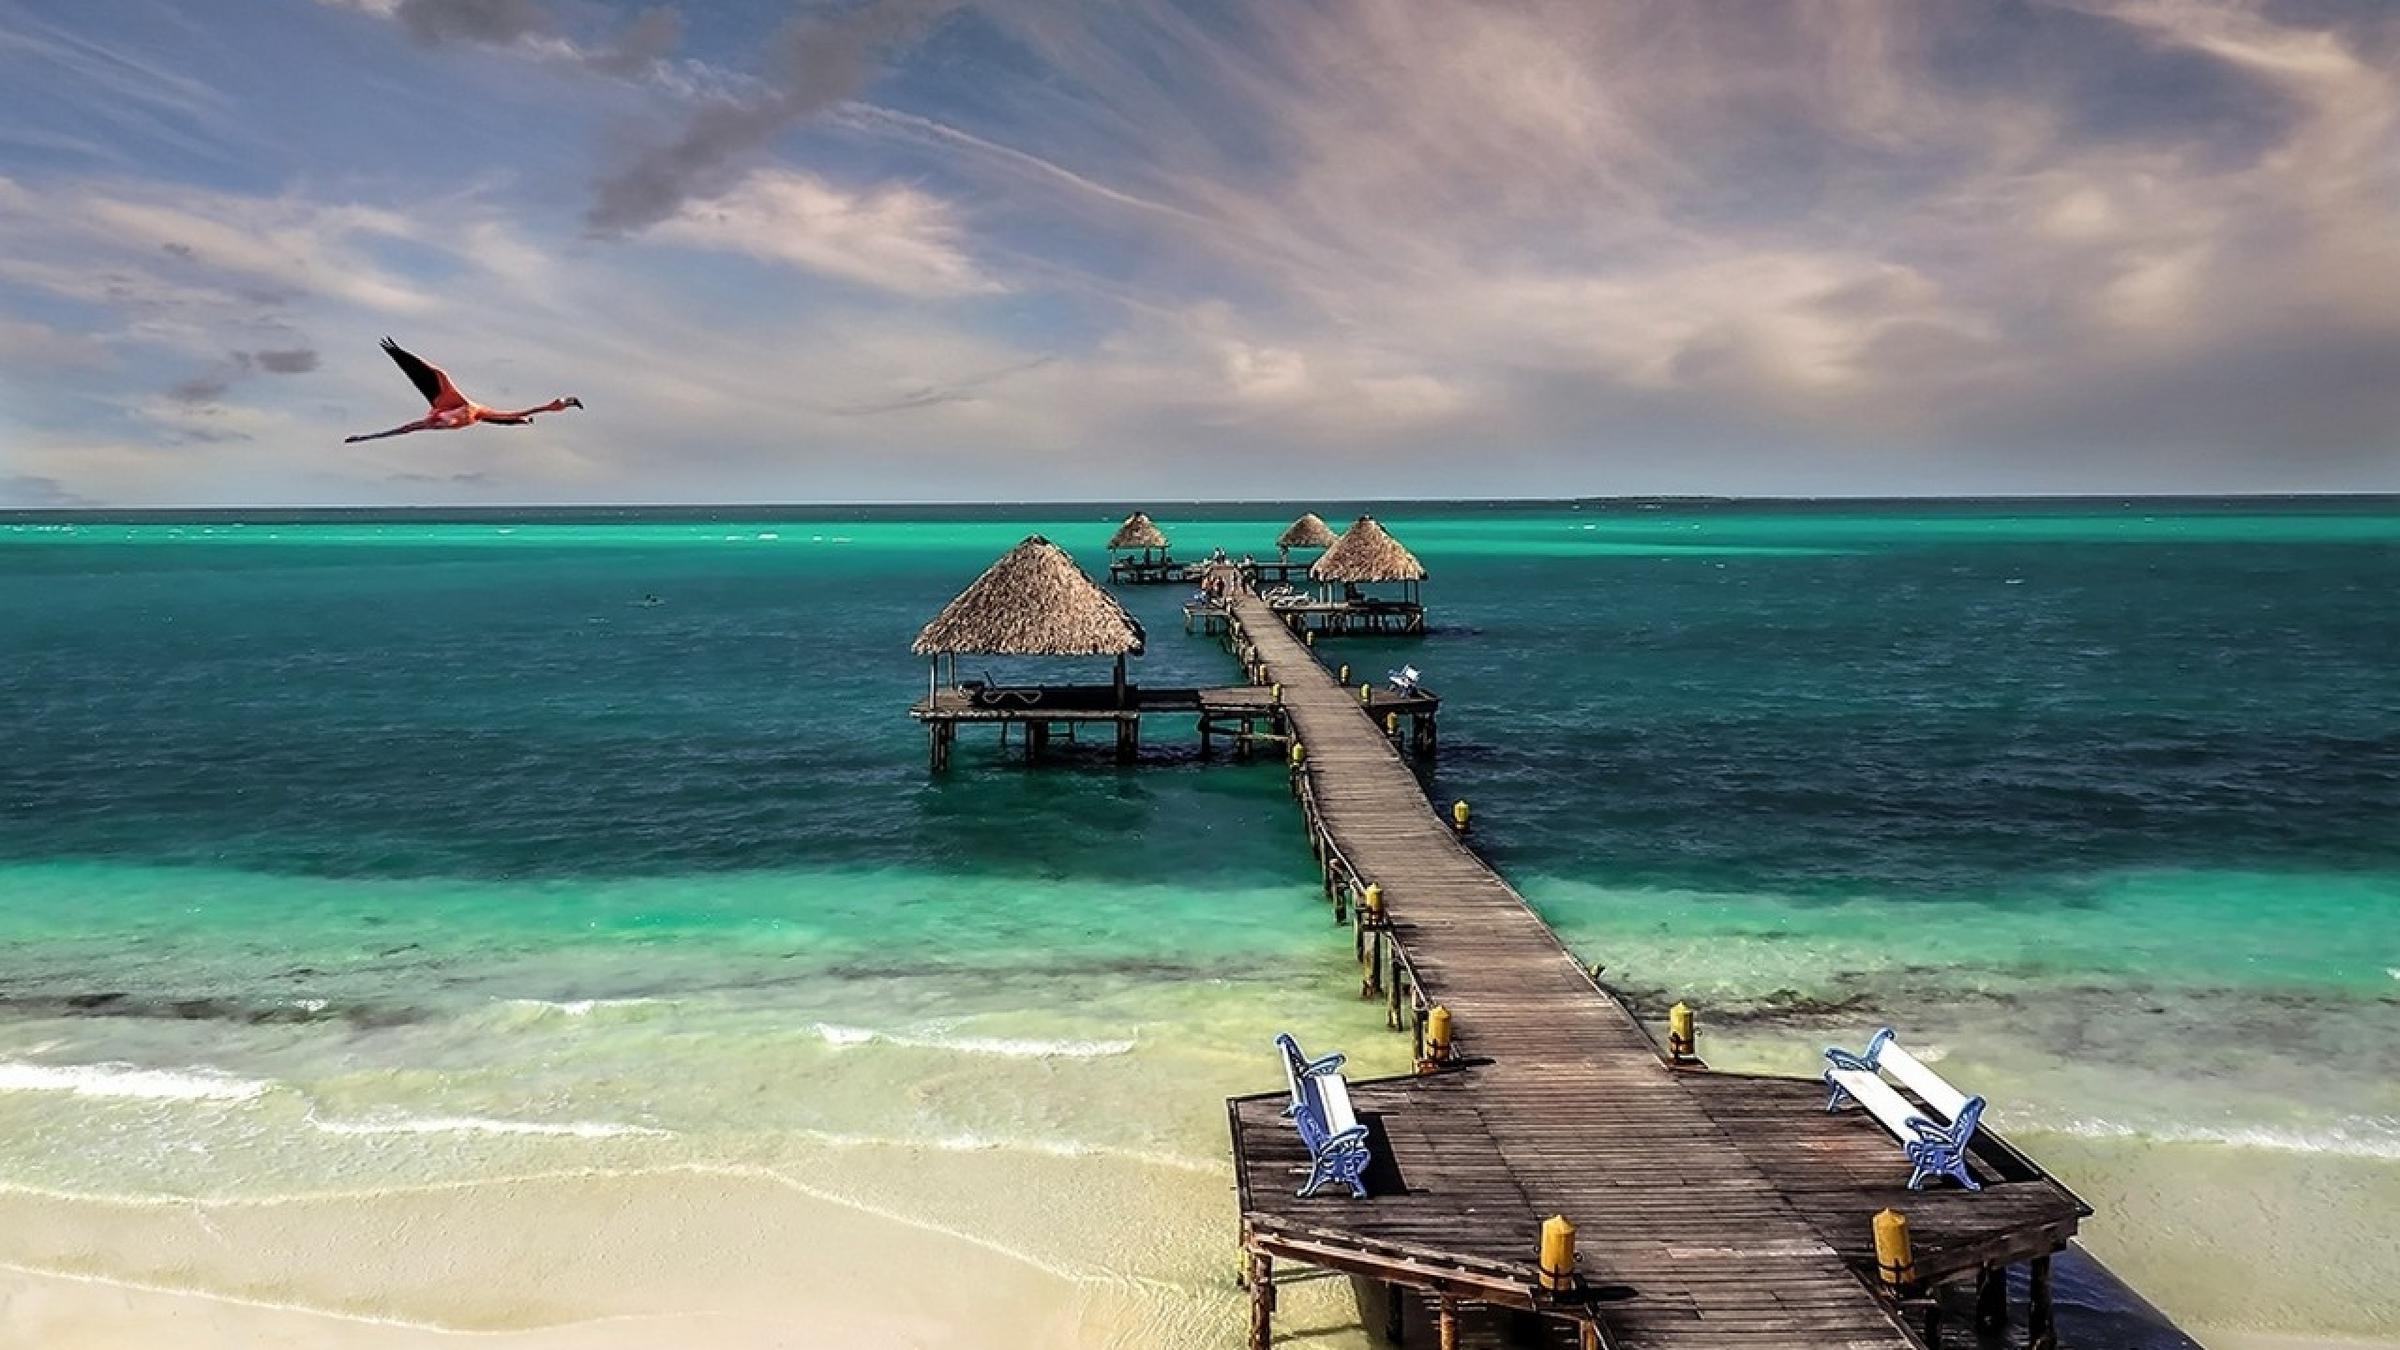 Cuba beach bird sea sand (2400x1350)